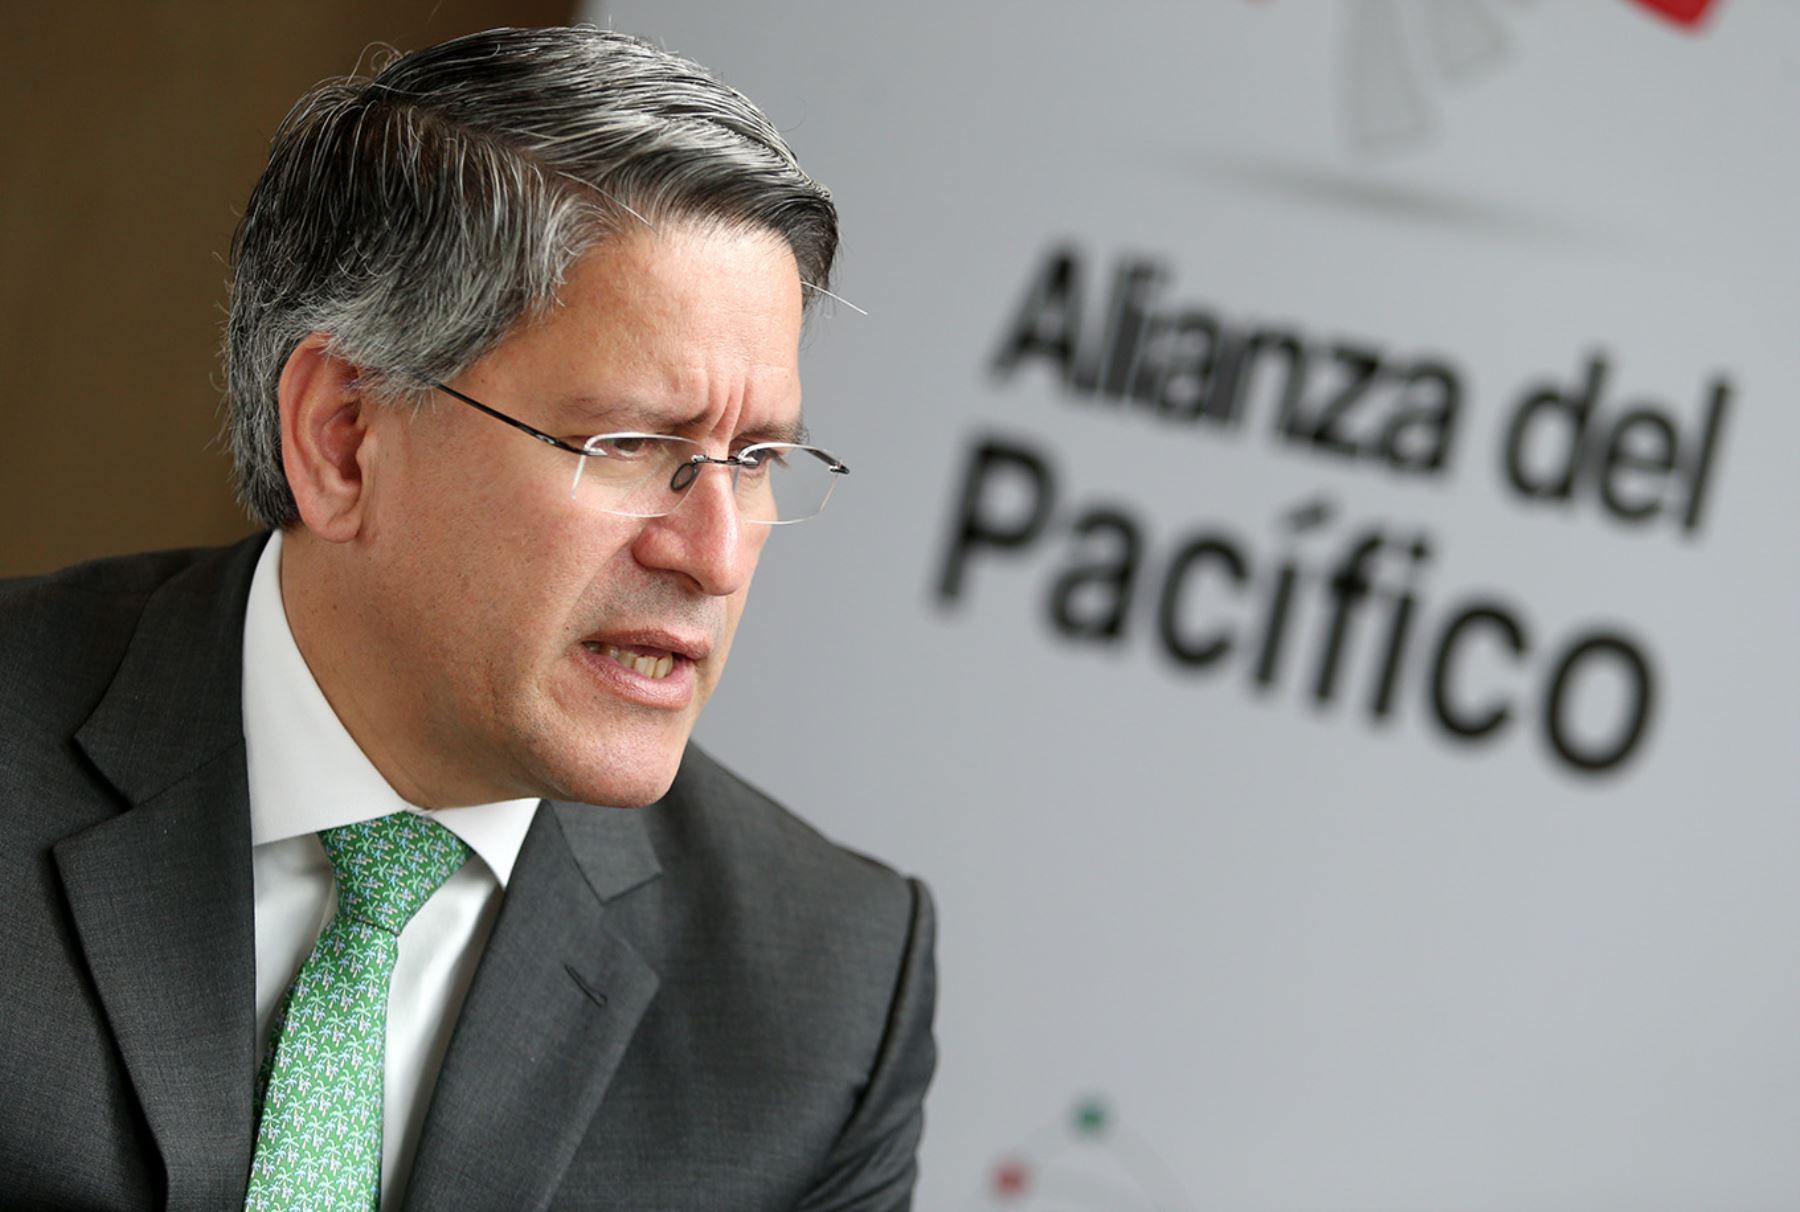 Martín Pérez, Presidente de la CONFIEP. Foto: ANDINA/Melina Mejía